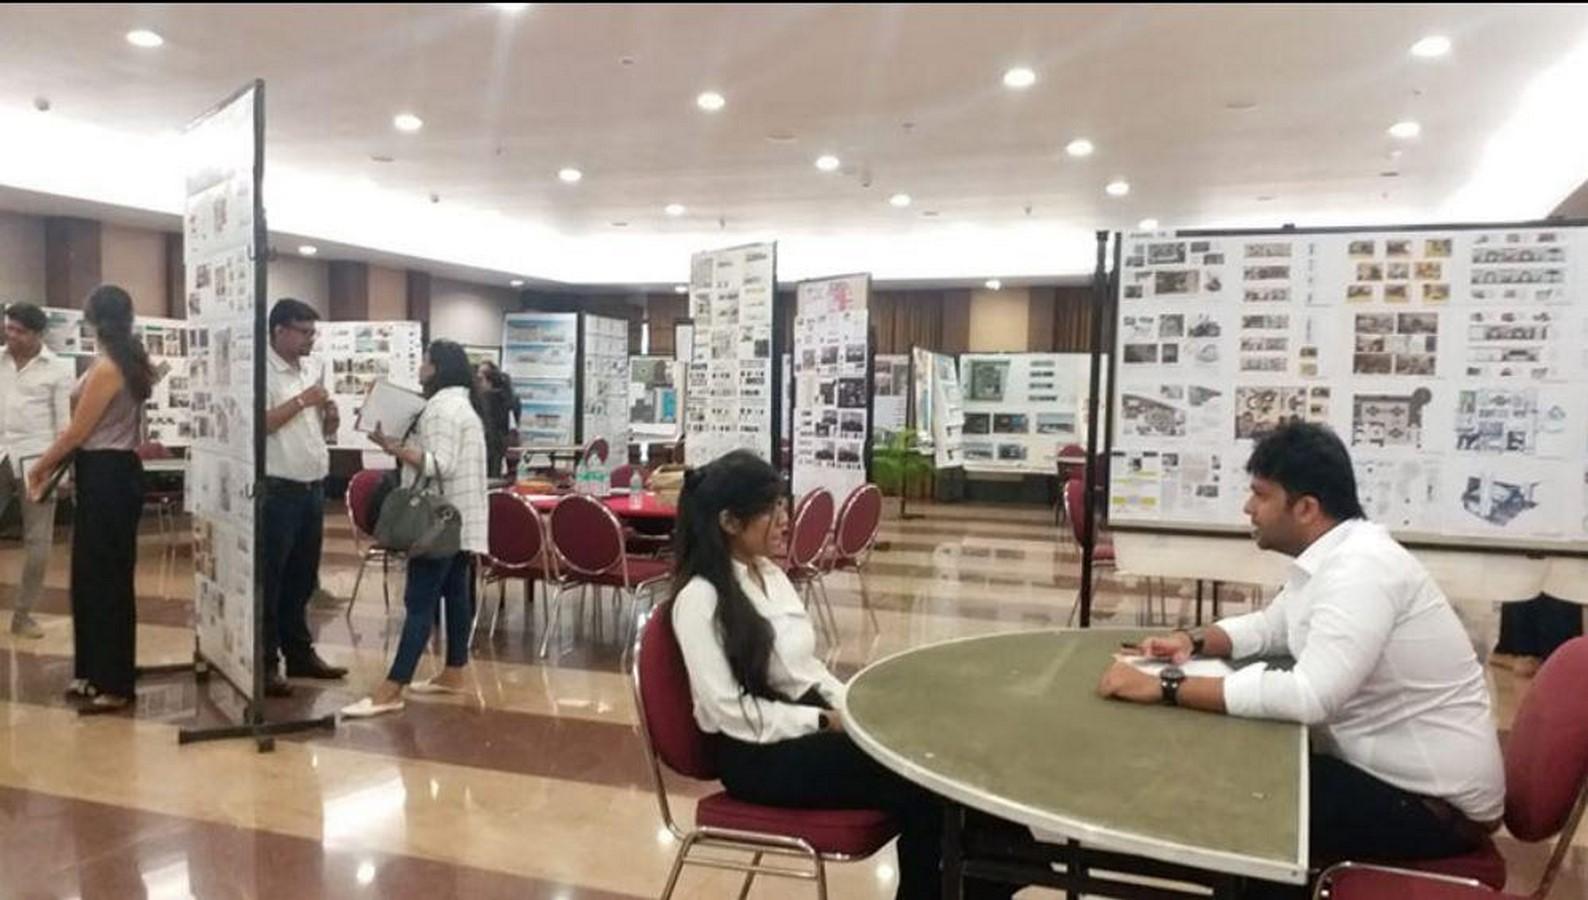 Campus Life at L.S. Raheja School of Architecture - Sheet2